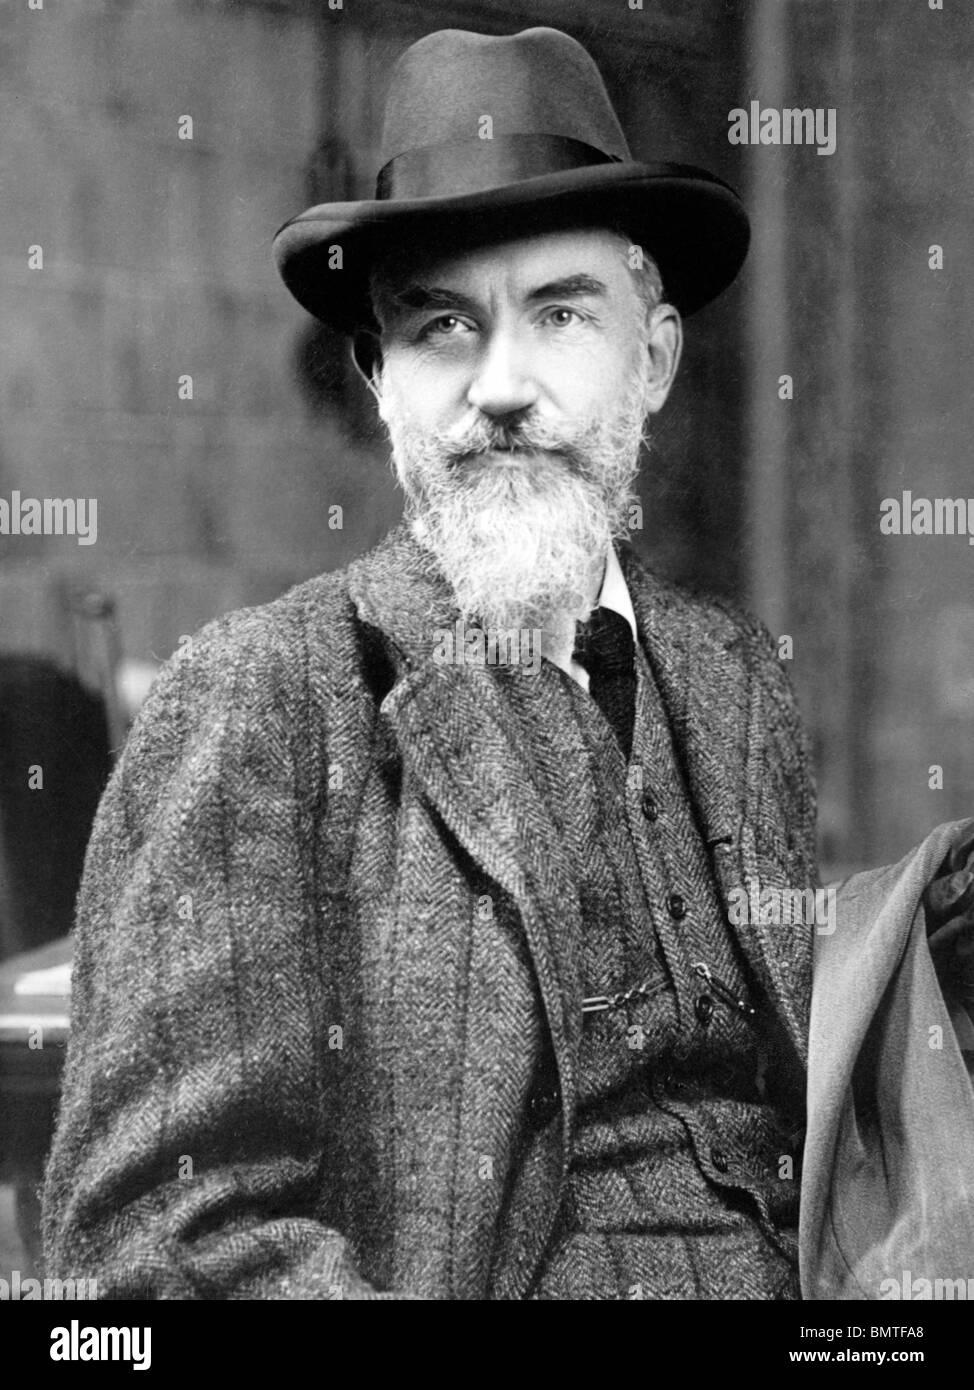 Portrait photo c1909 of Irish playwright George Bernard Shaw (1856 - 1950) - winner of the Nobel Prize in Literature - Stock Image